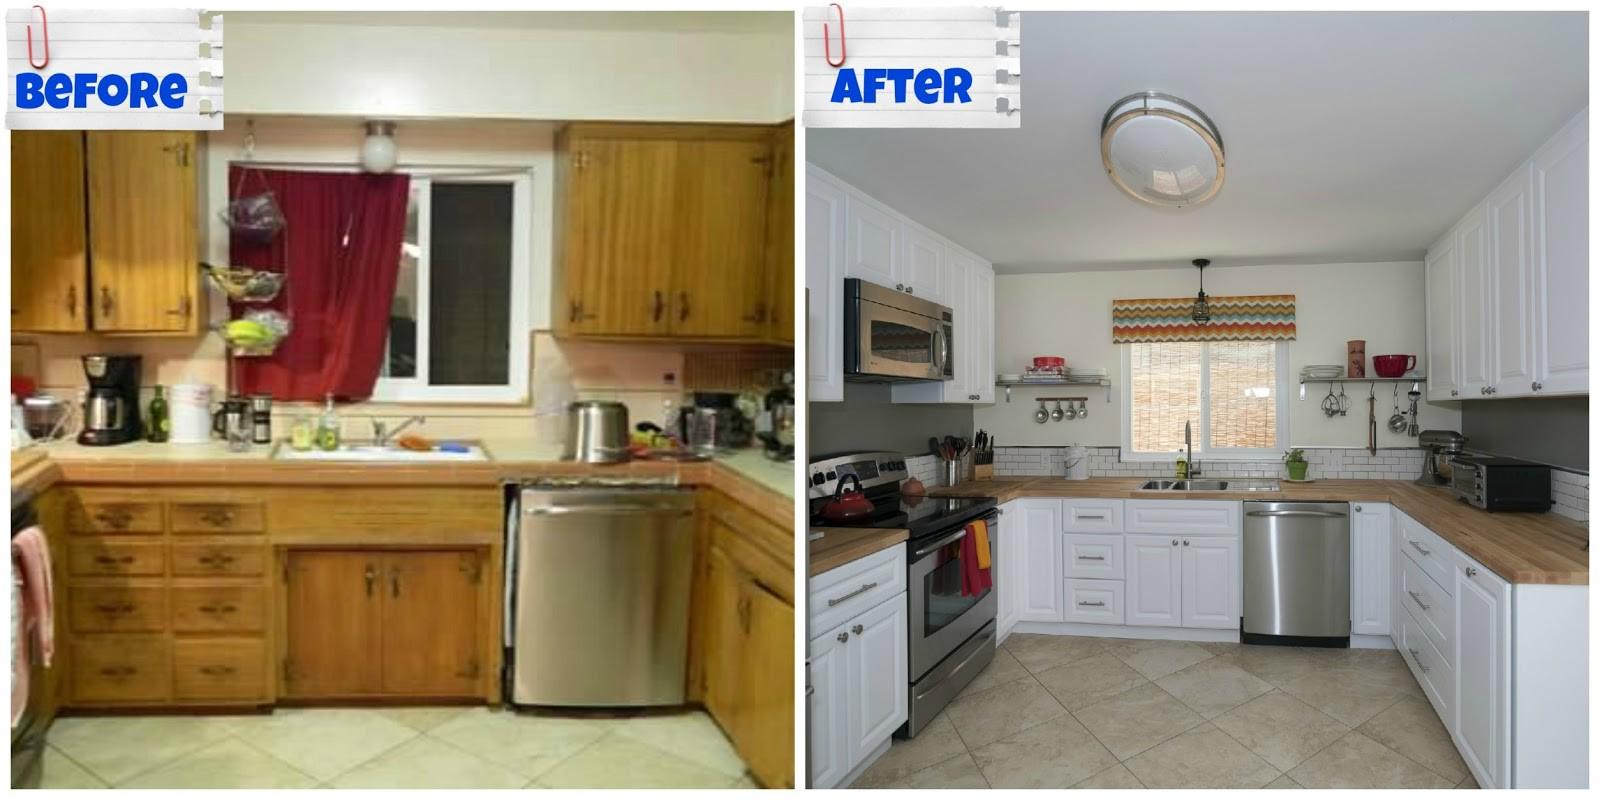 diy kitchen renovation ideas diy kitchen remodel on a budget OCFXCZM